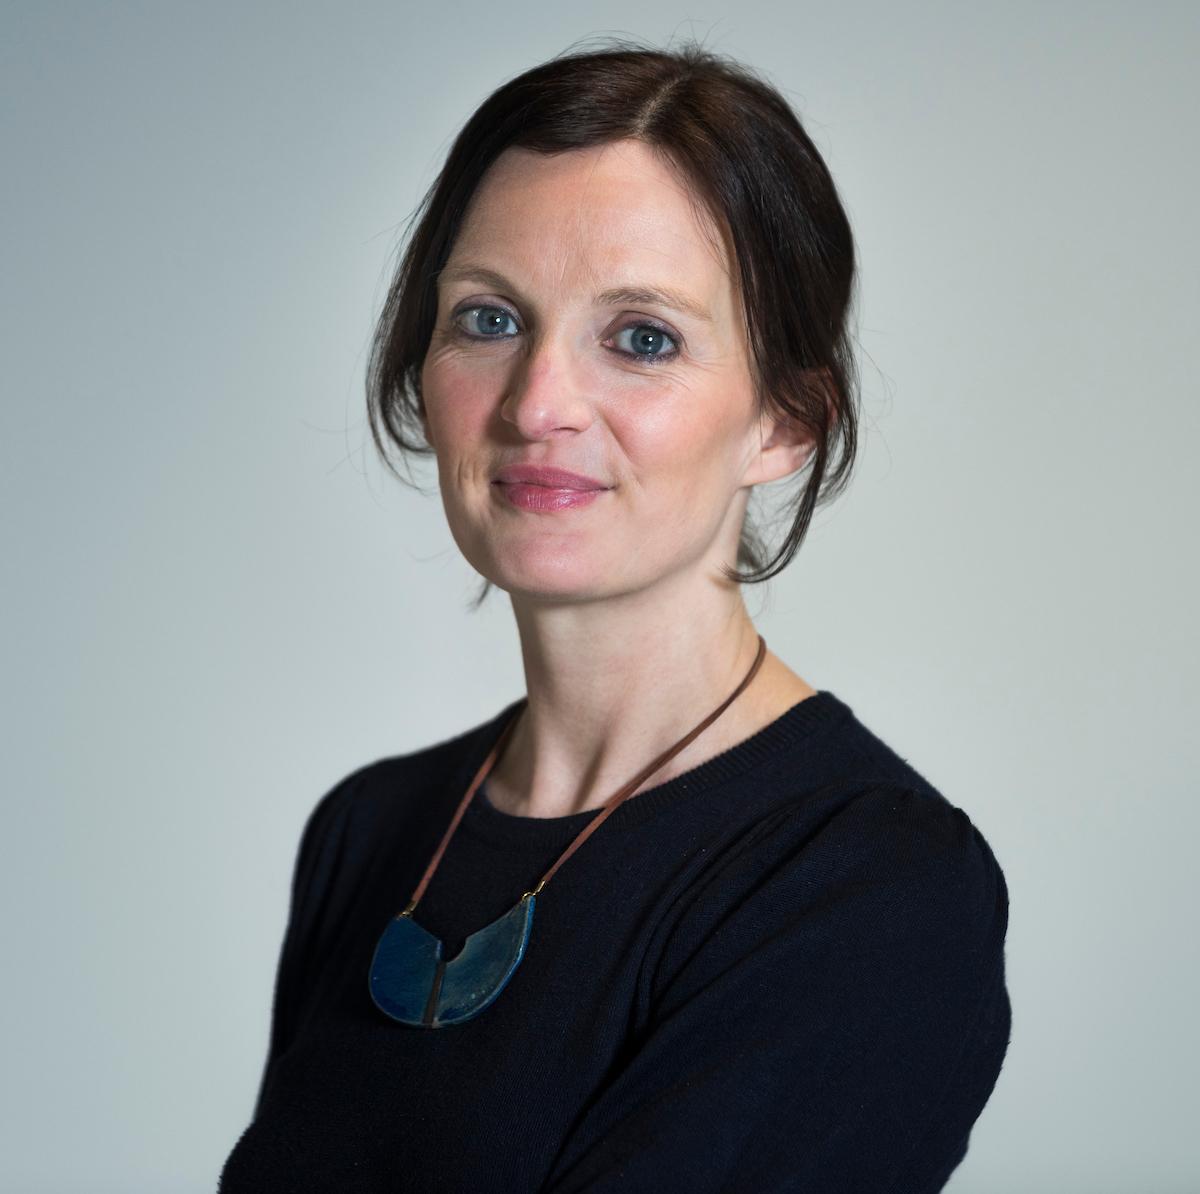 Staff Reporter Jane Bradley